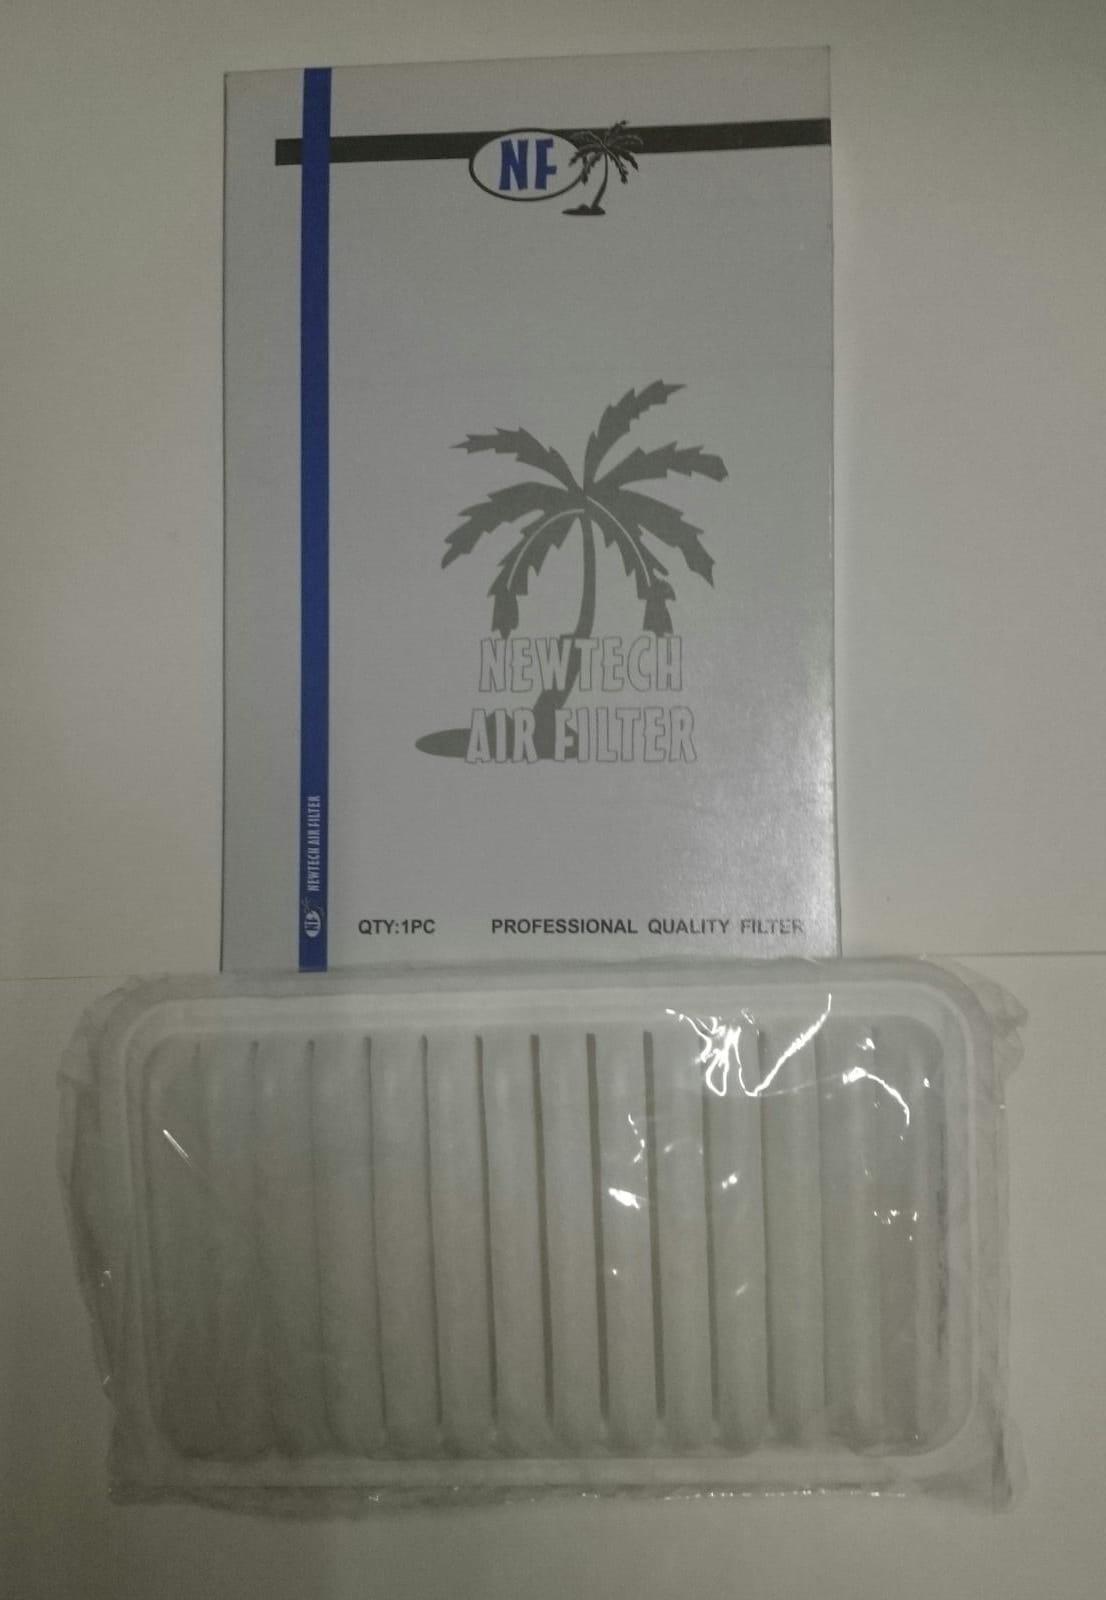 SUZUKI SWIFT SPLASH 2008-2009-2010 1,0 - 1,2 VVT / HAVA FİLTRESİ